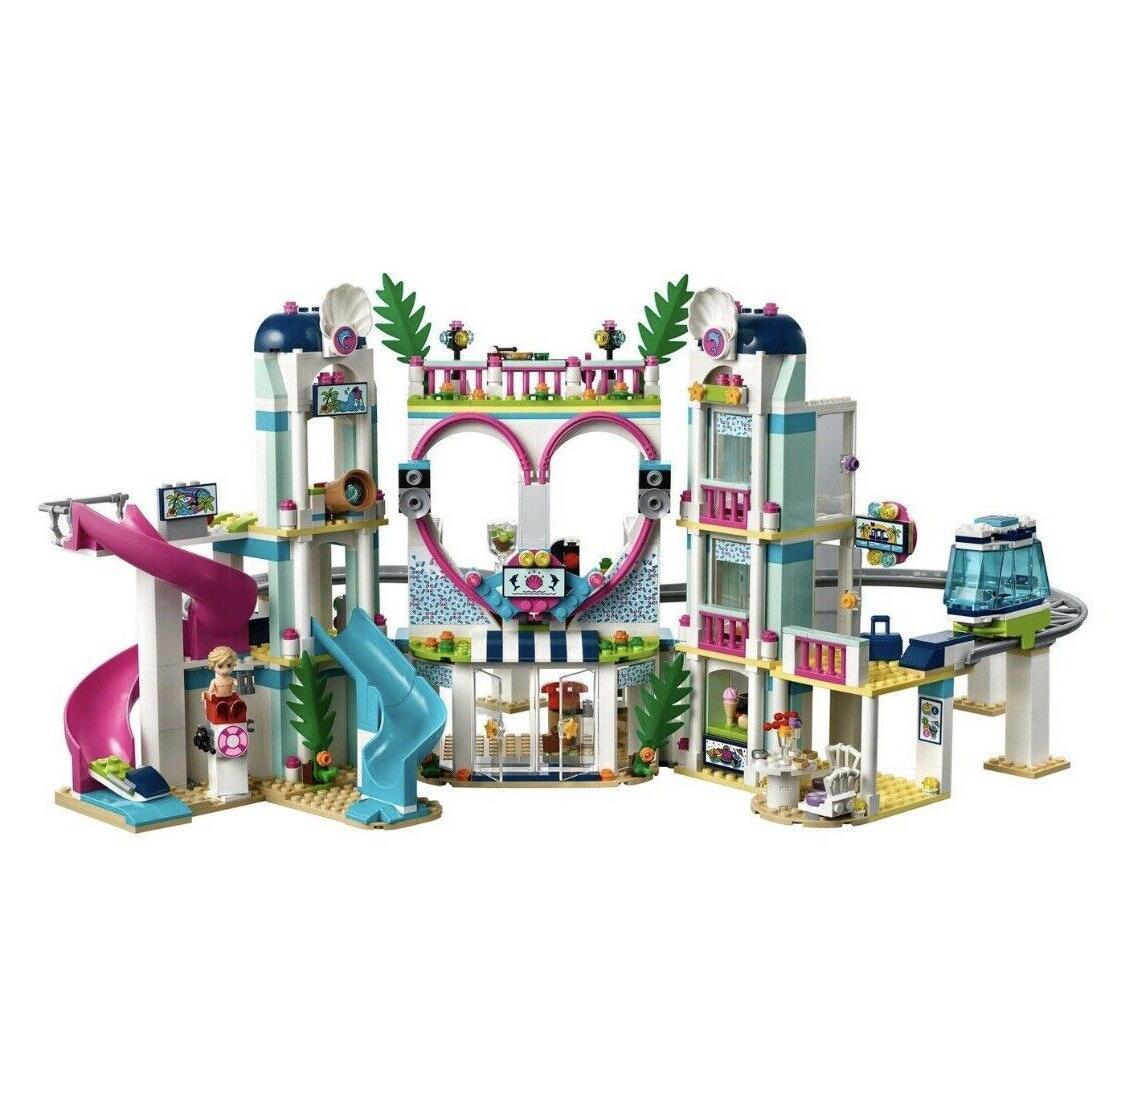 LEGO® Friends City Waterpark Building Sets